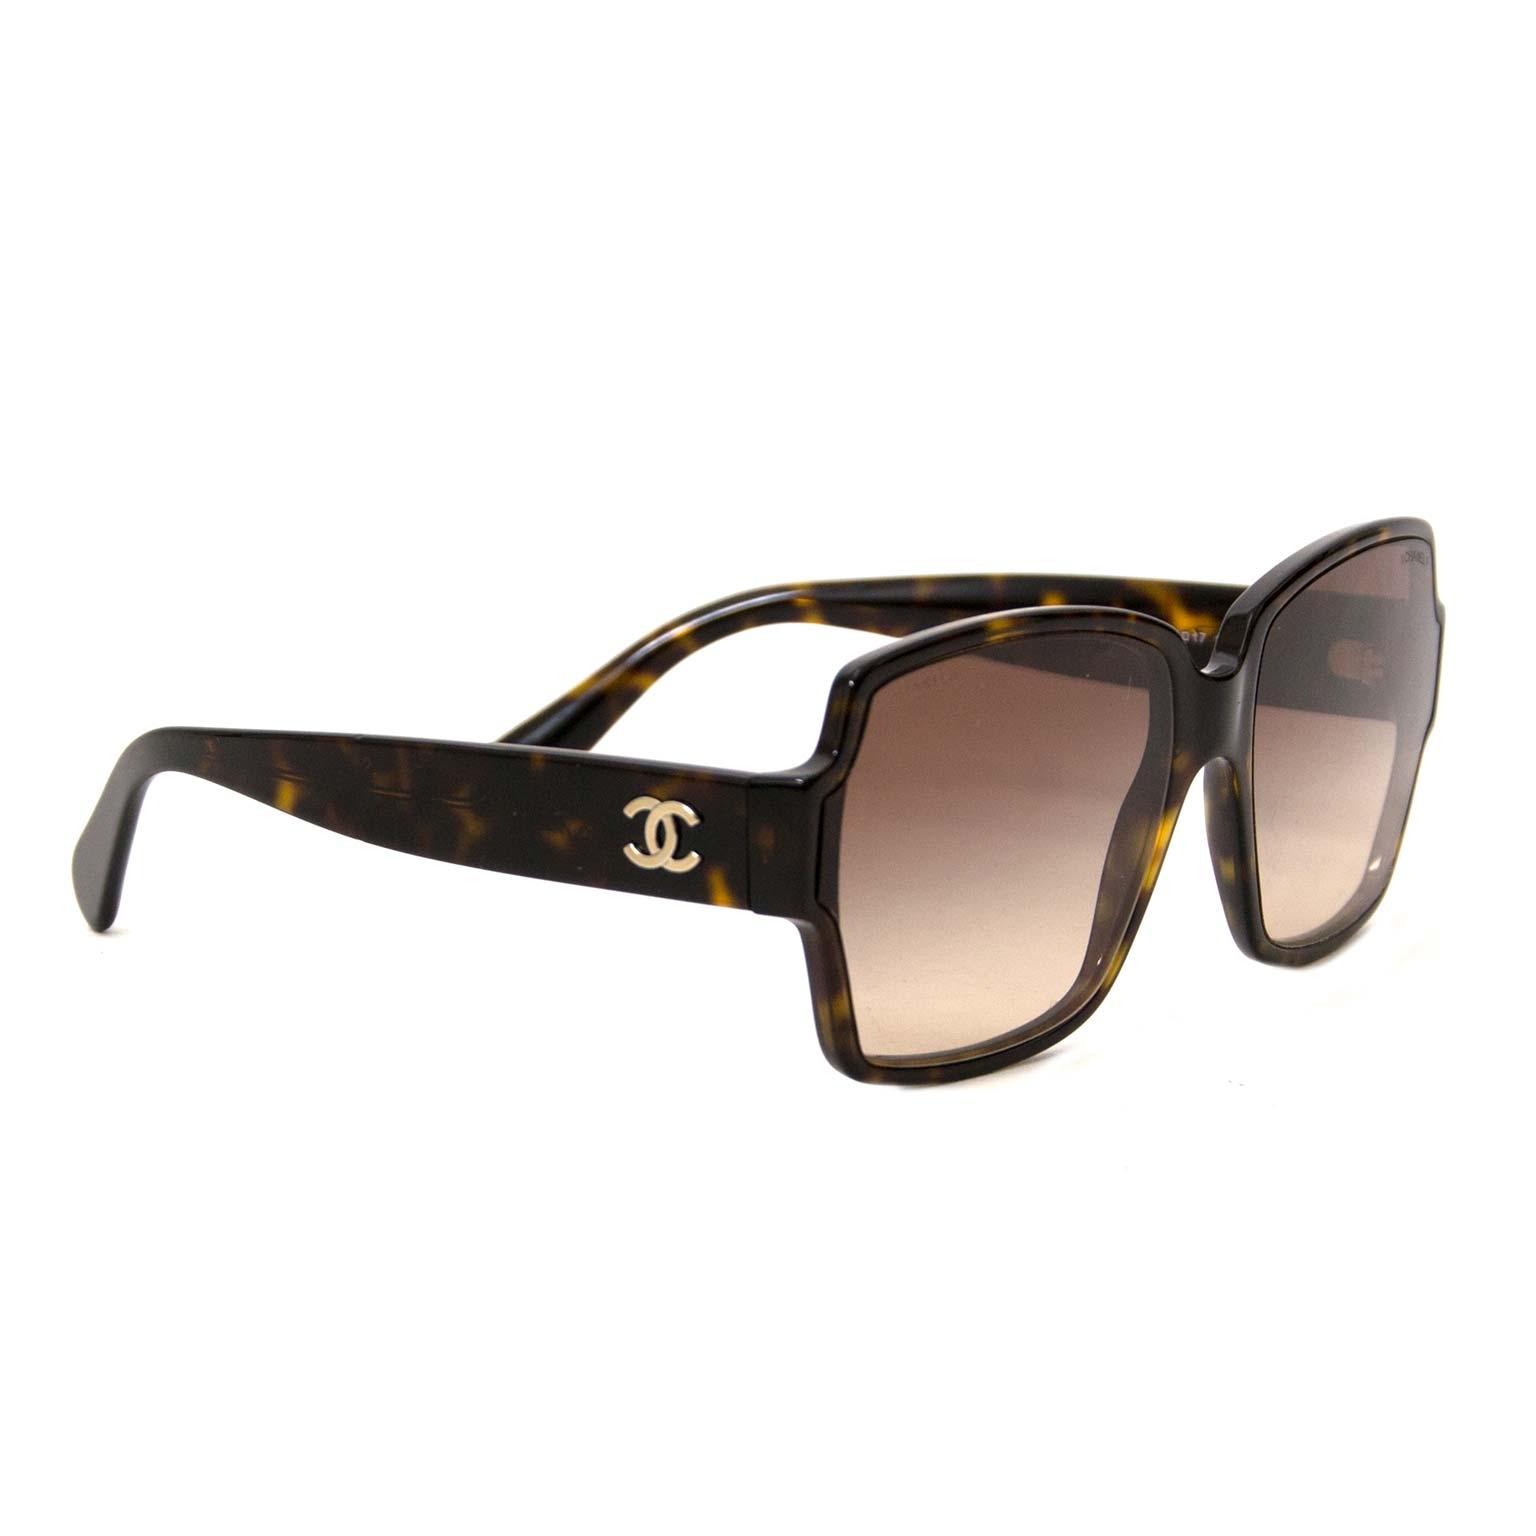 Chanel Brown Tortoise Square Sunglasses te koop  bij Labellov